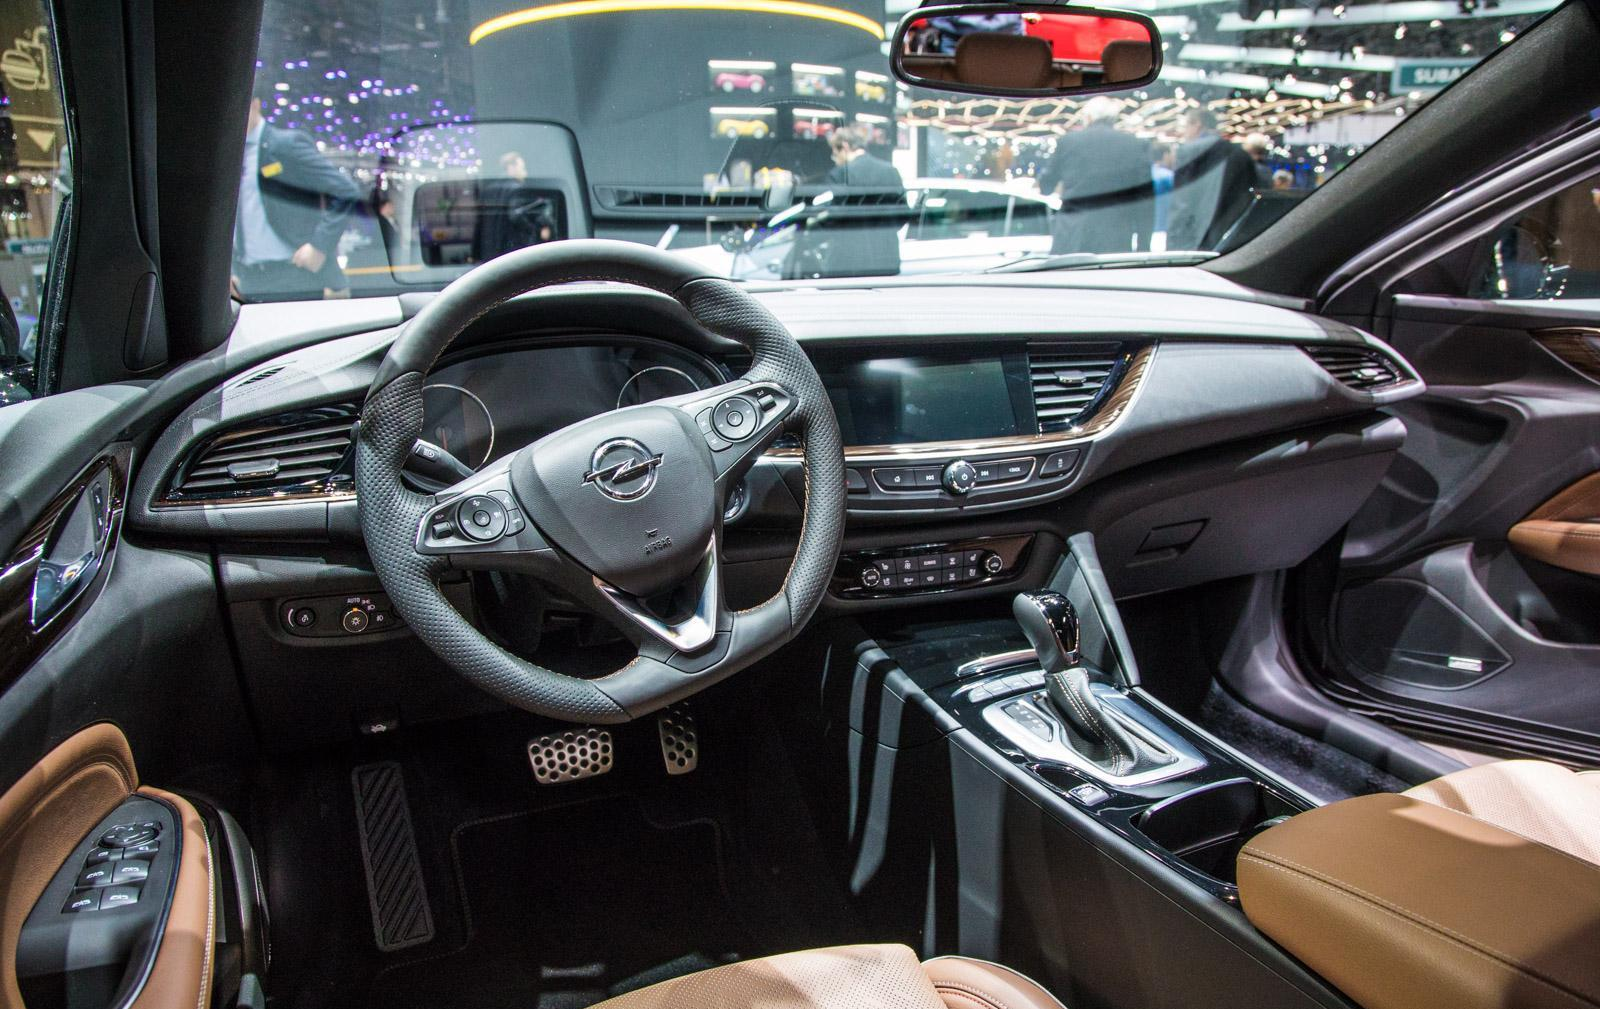 Opel-insignia-018